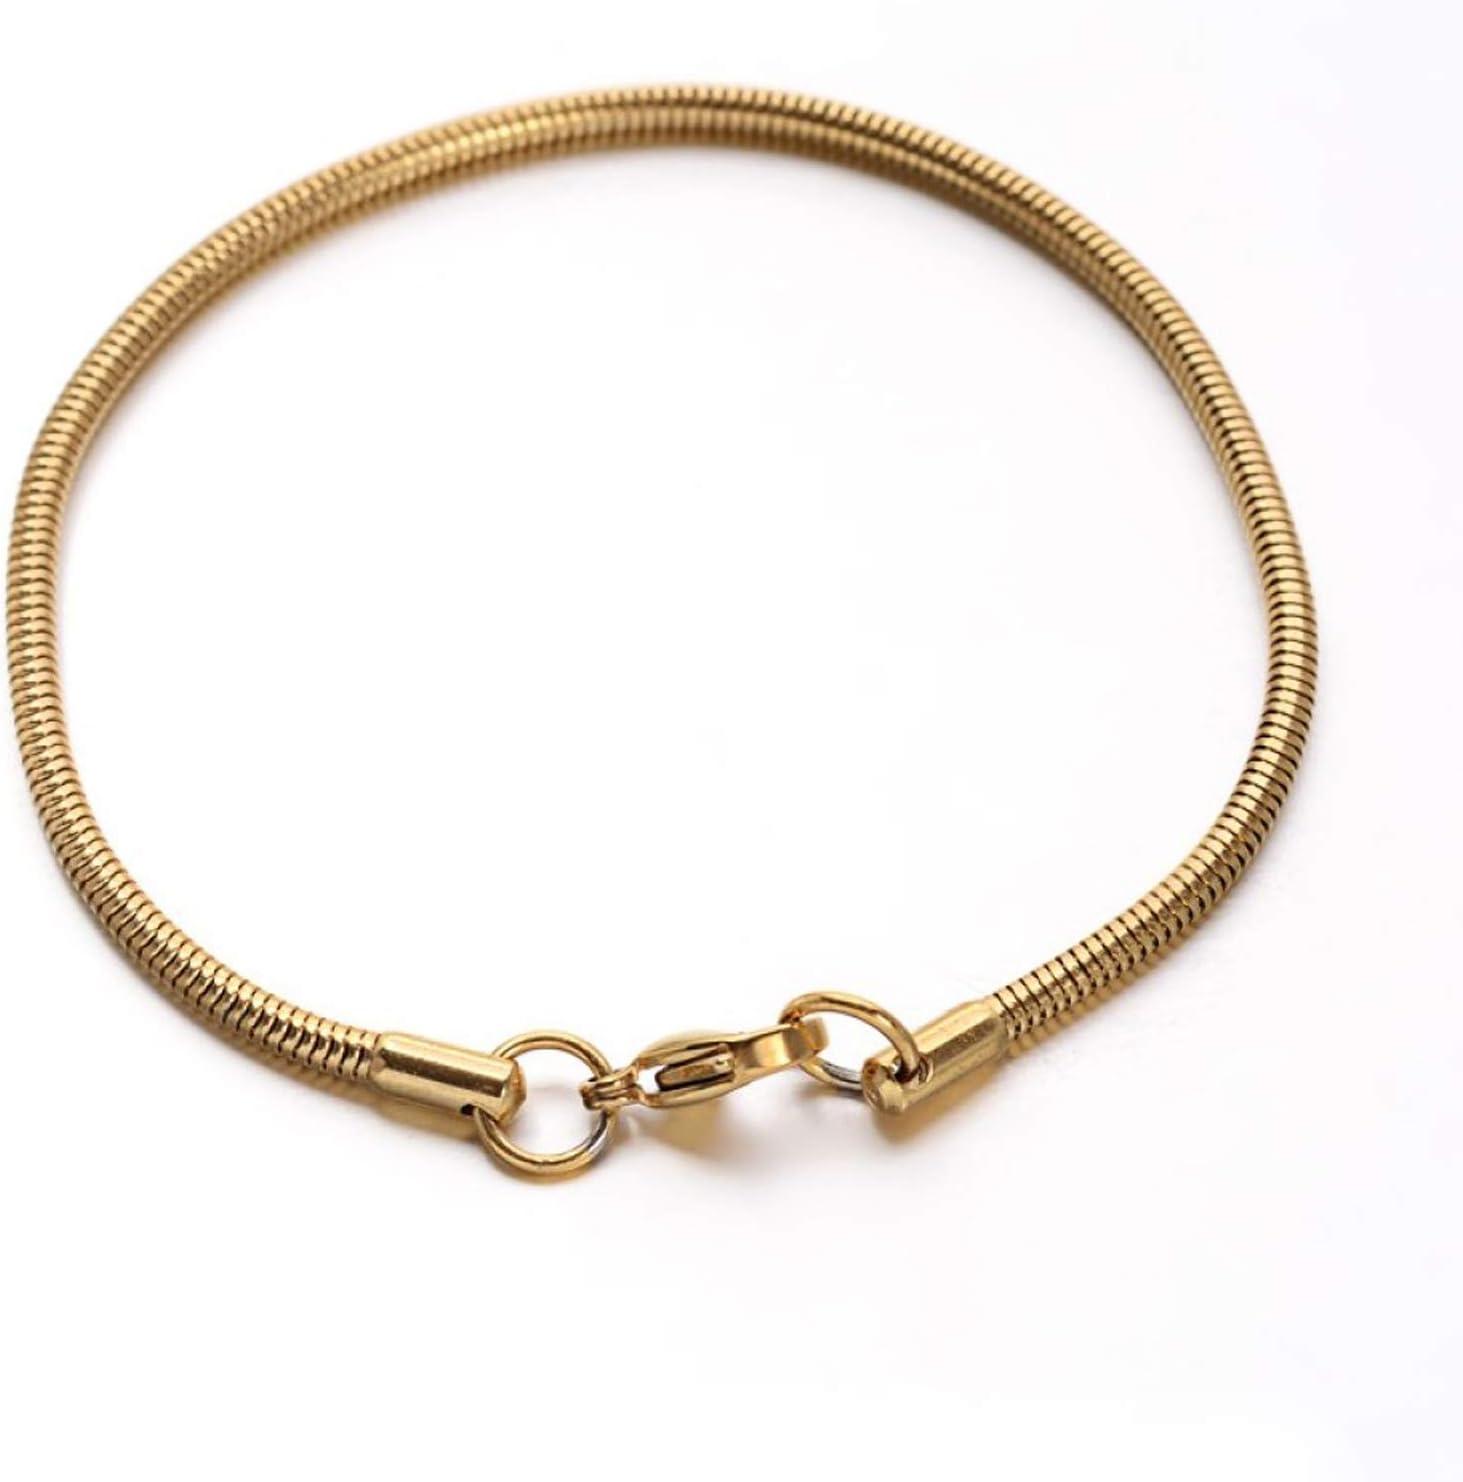 Pandahall 6 Stands Stainless Steel 7-1 Popular popular Bracelets Snake 2 Japan's largest assortment Chains